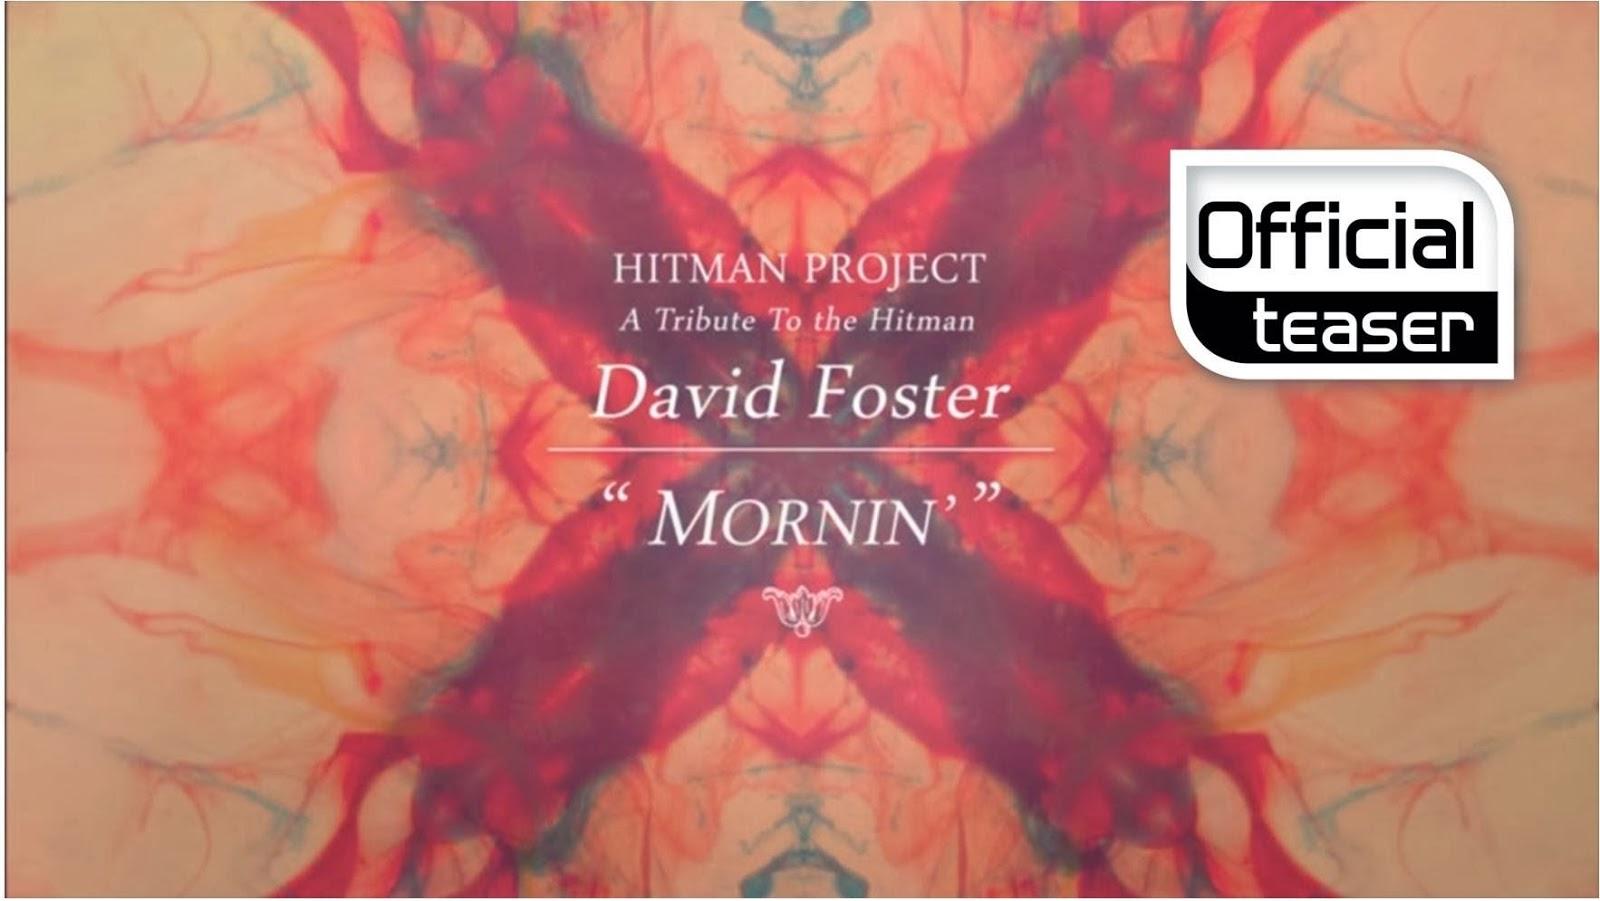 Good Morning Lirik : Fufu vifi lirik lagu g na mornin